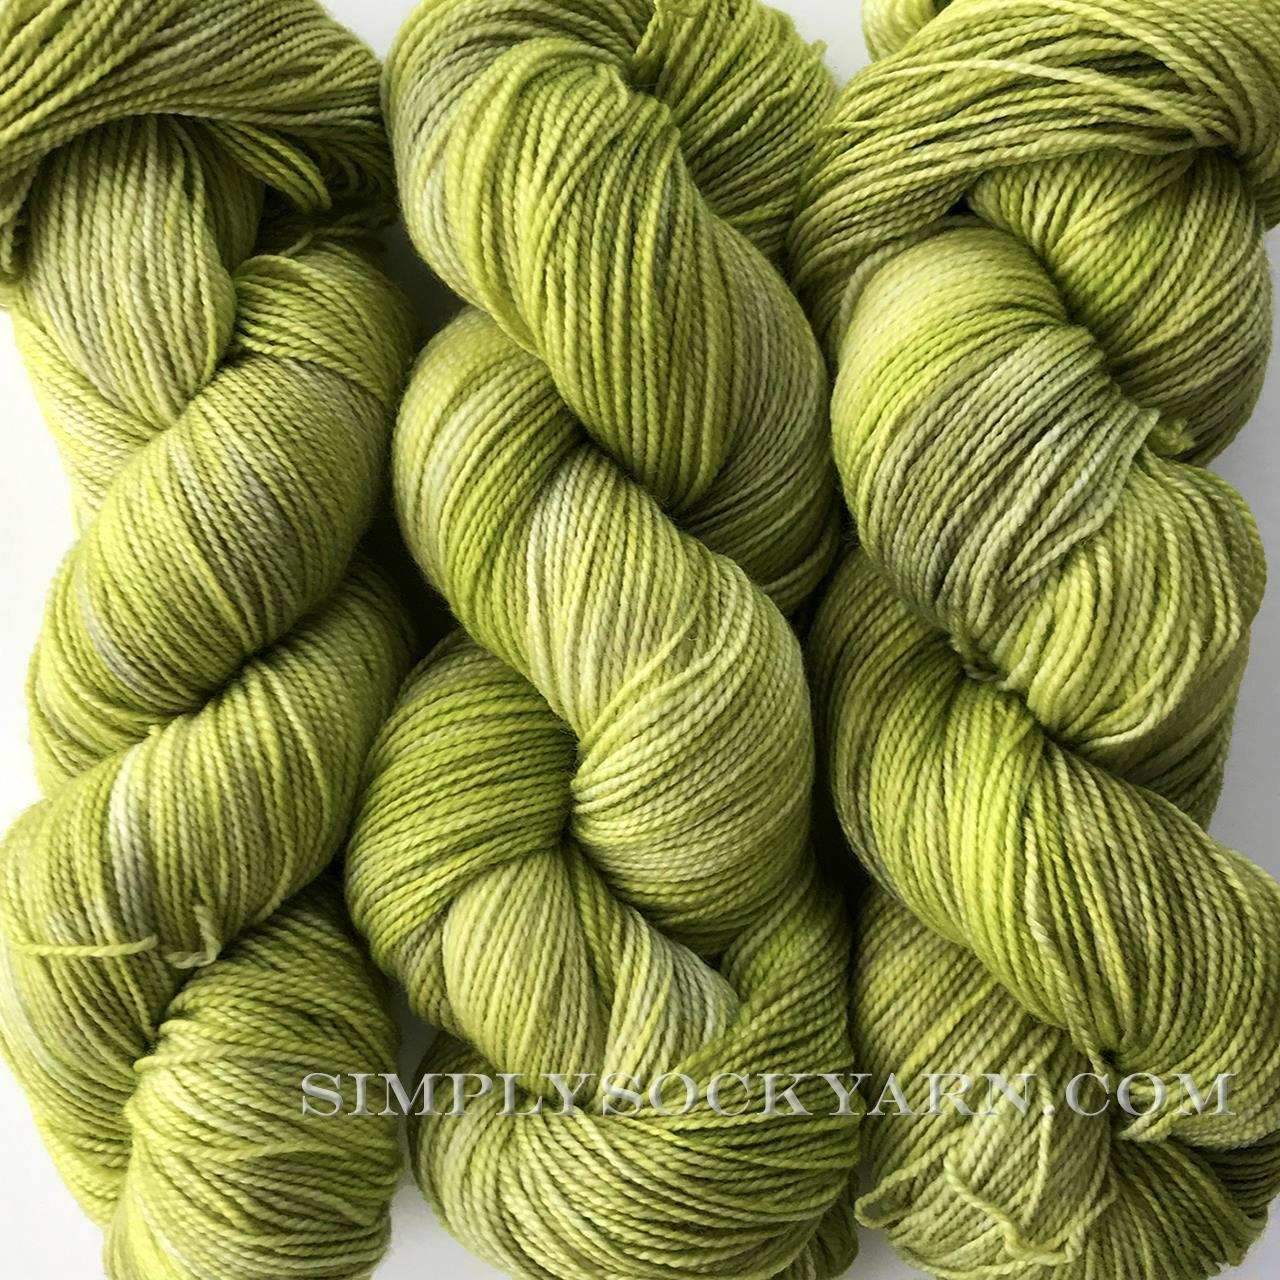 SY Bliss Sock Absinthe -